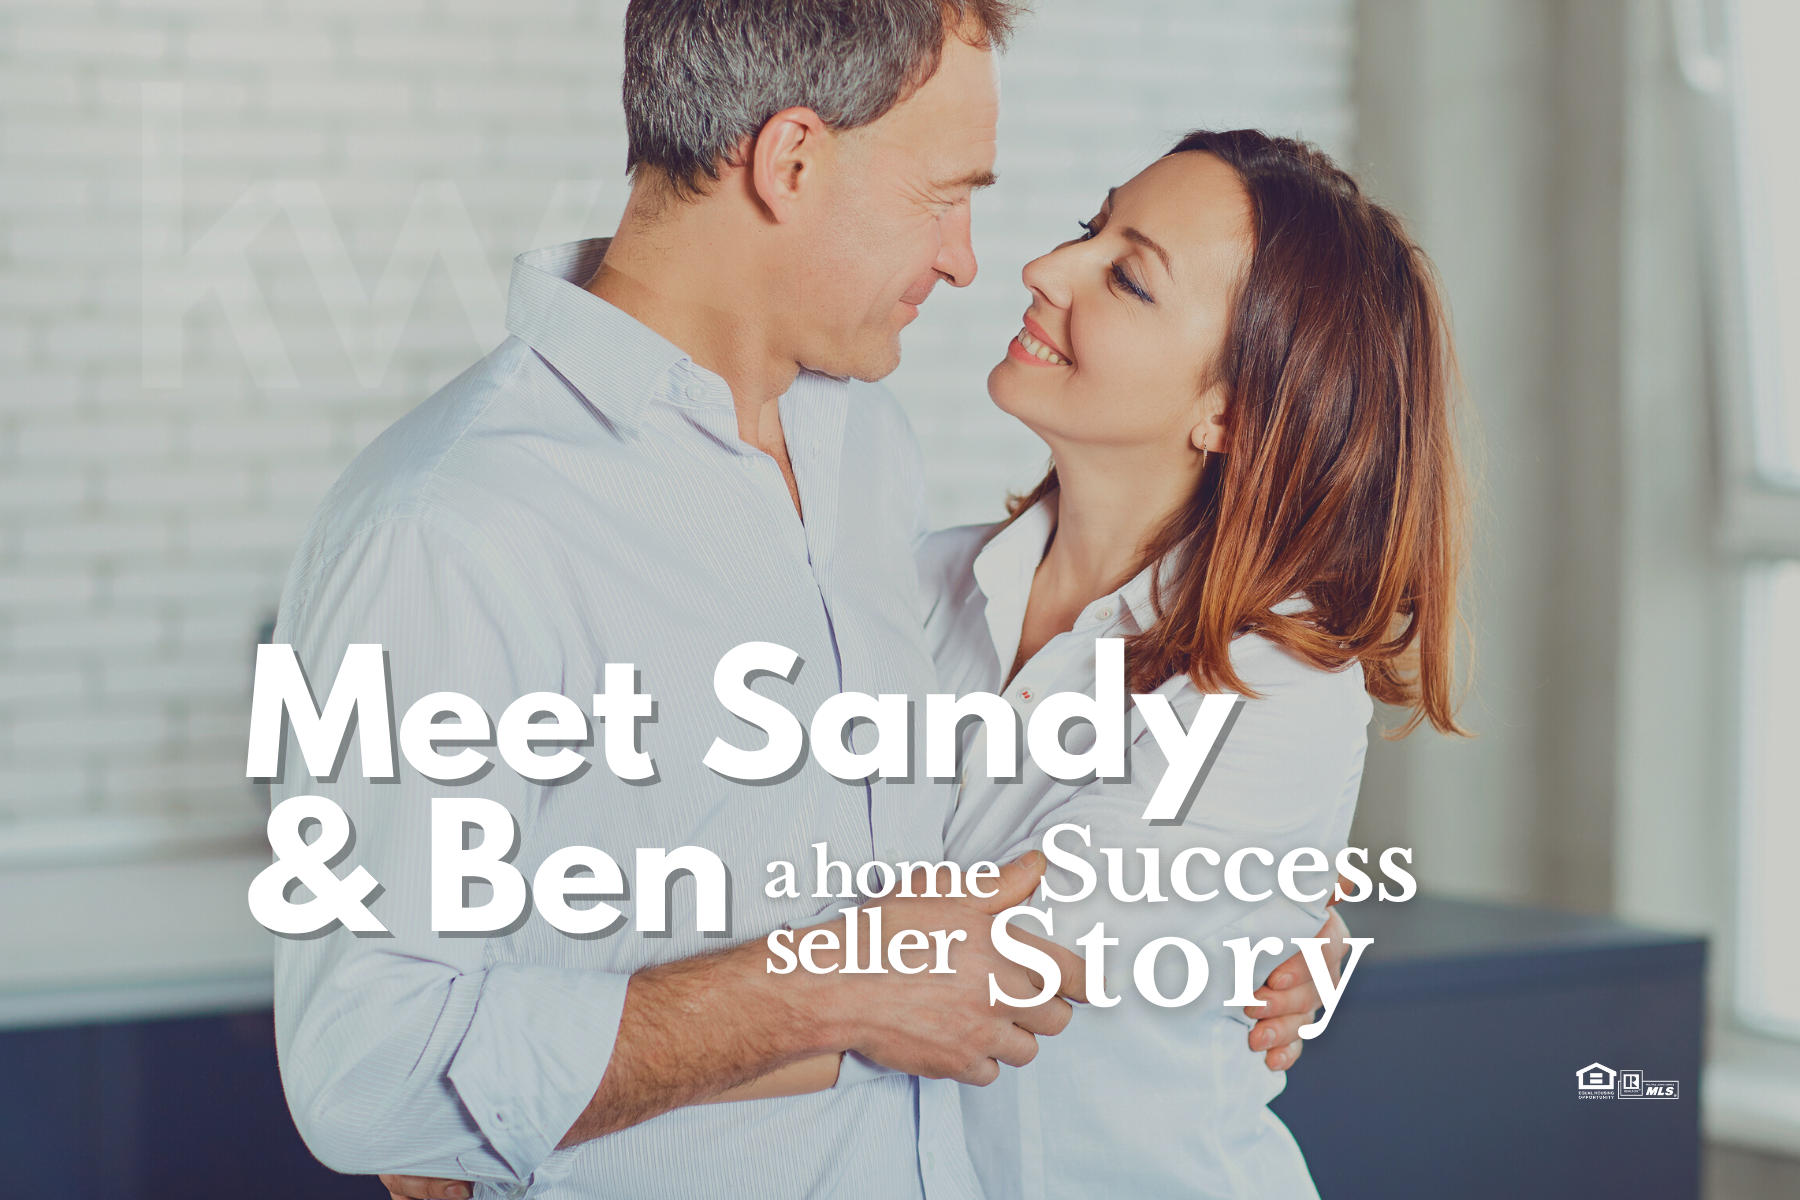 Meet Sandy and Ben